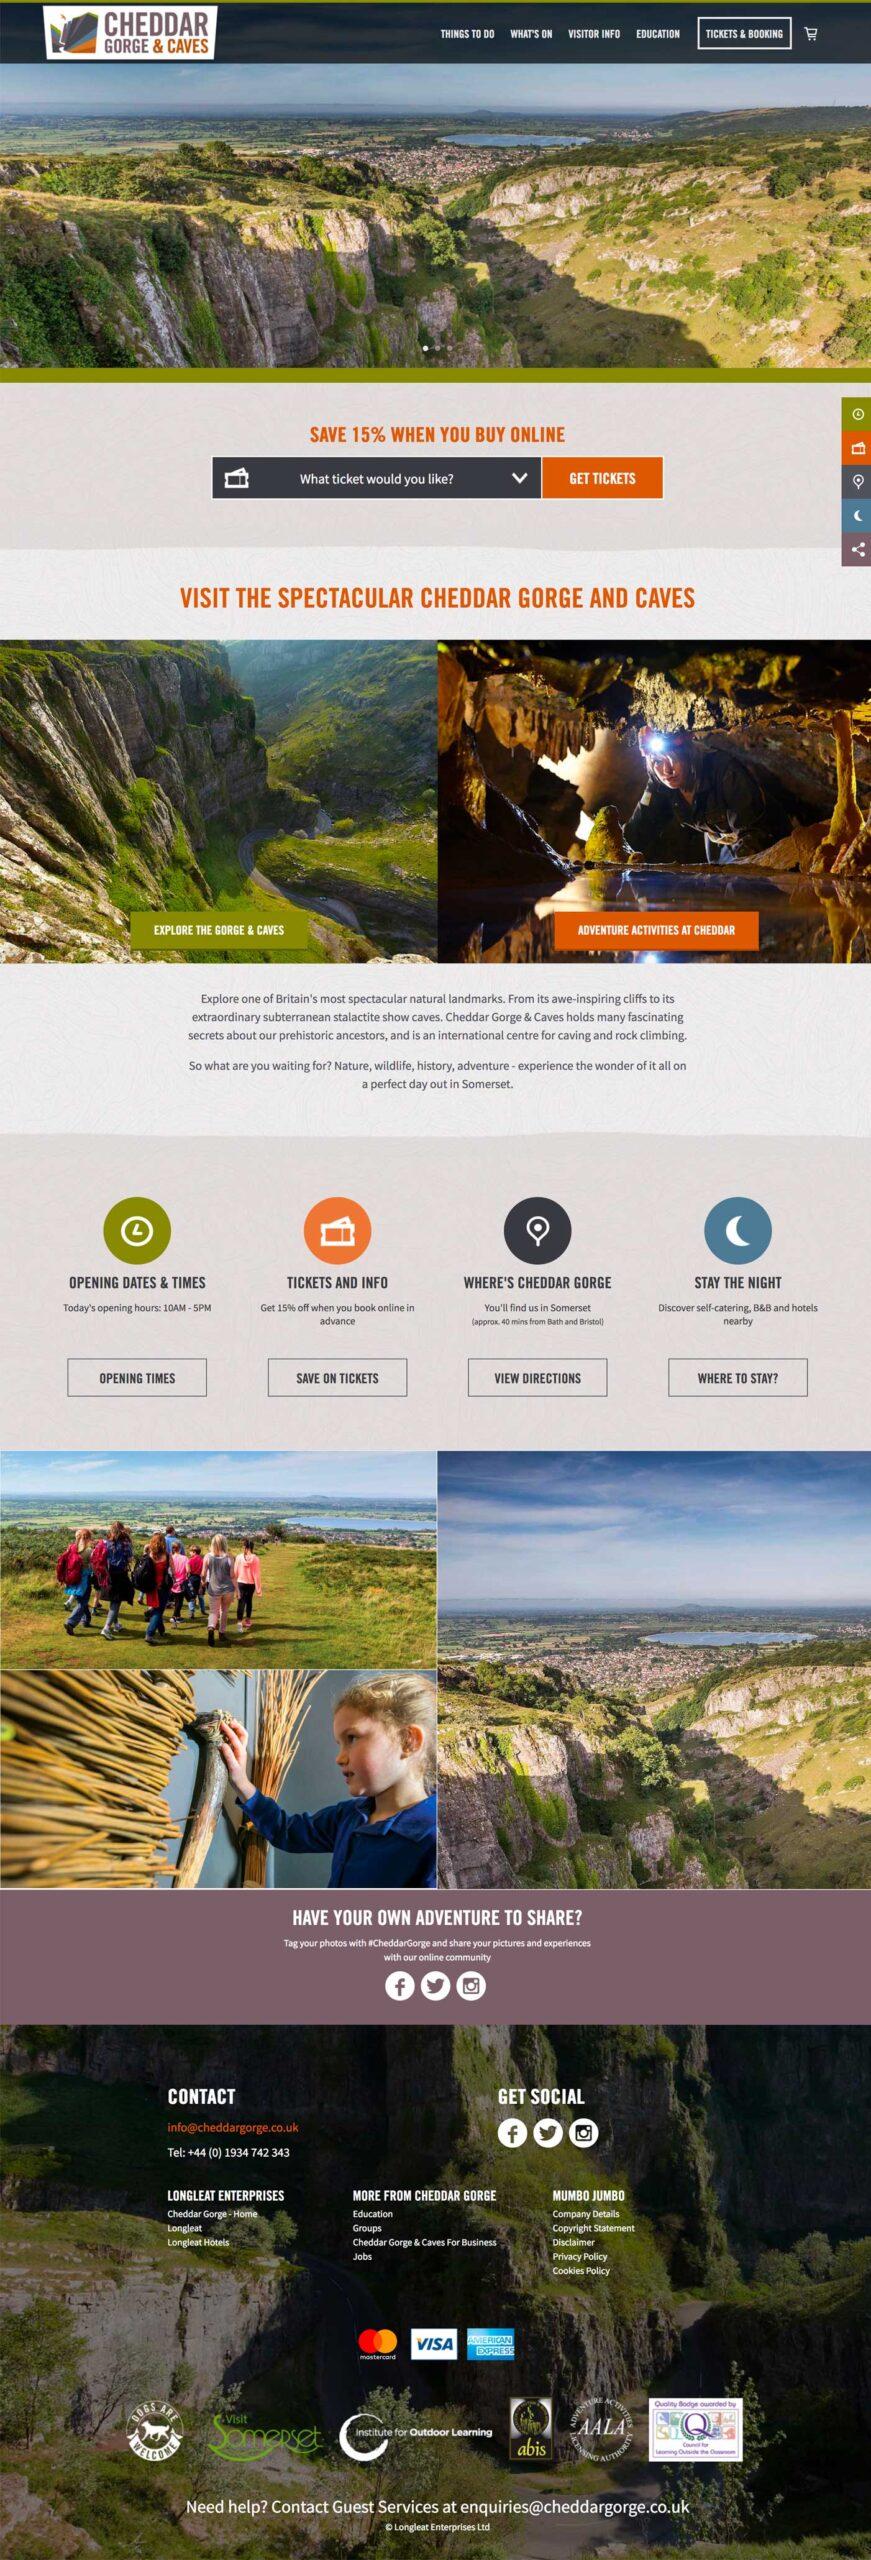 Cheddar Gorge full website visual